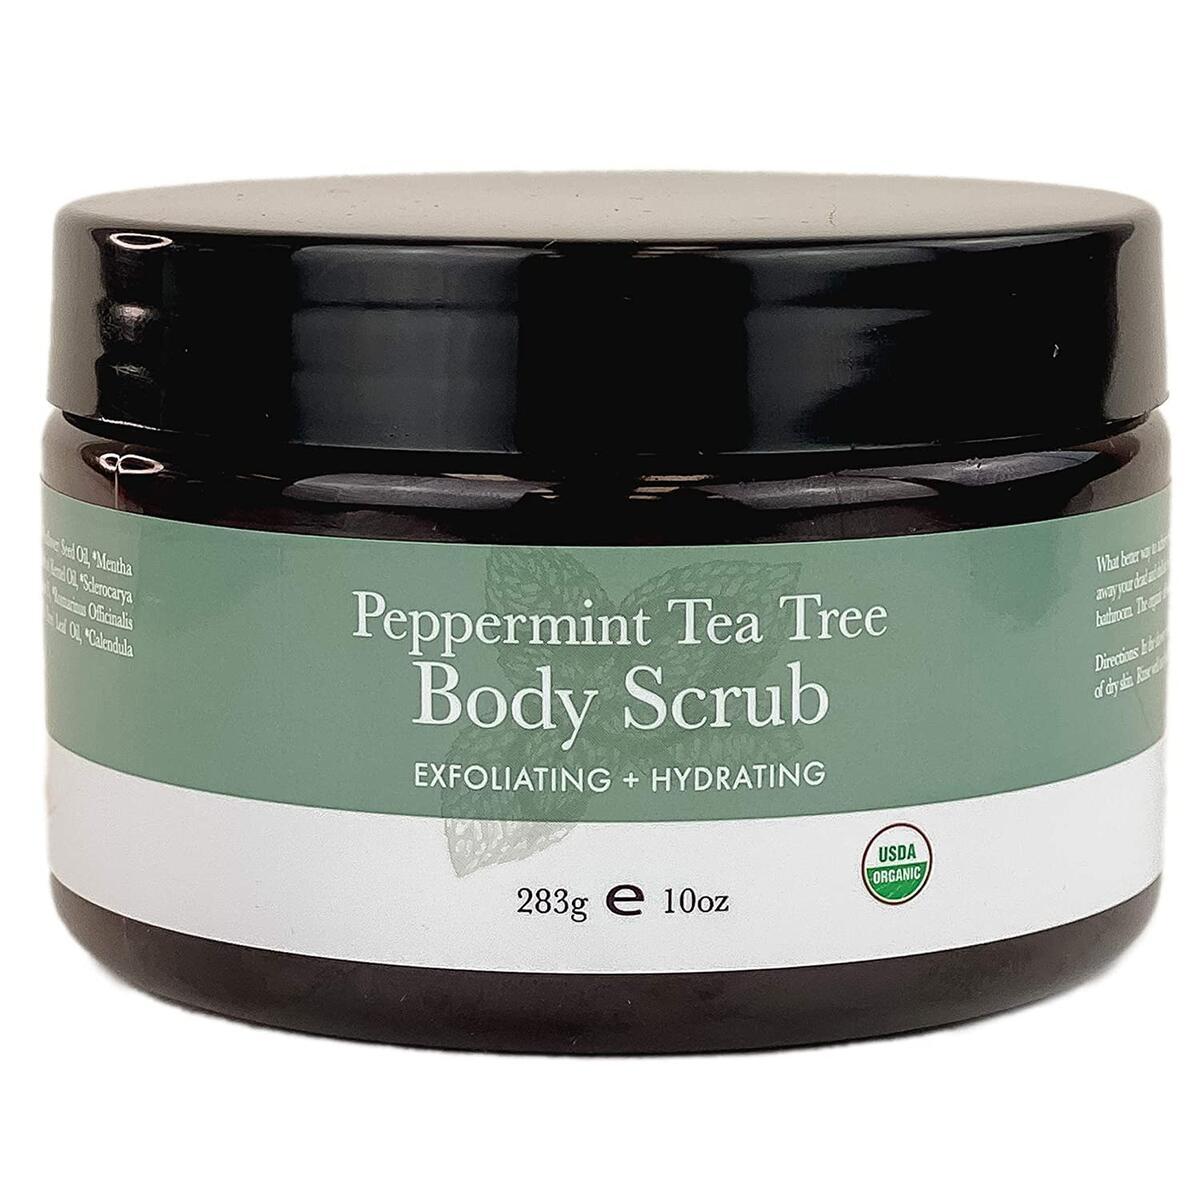 Peppermint Tea Tree Body Scrub